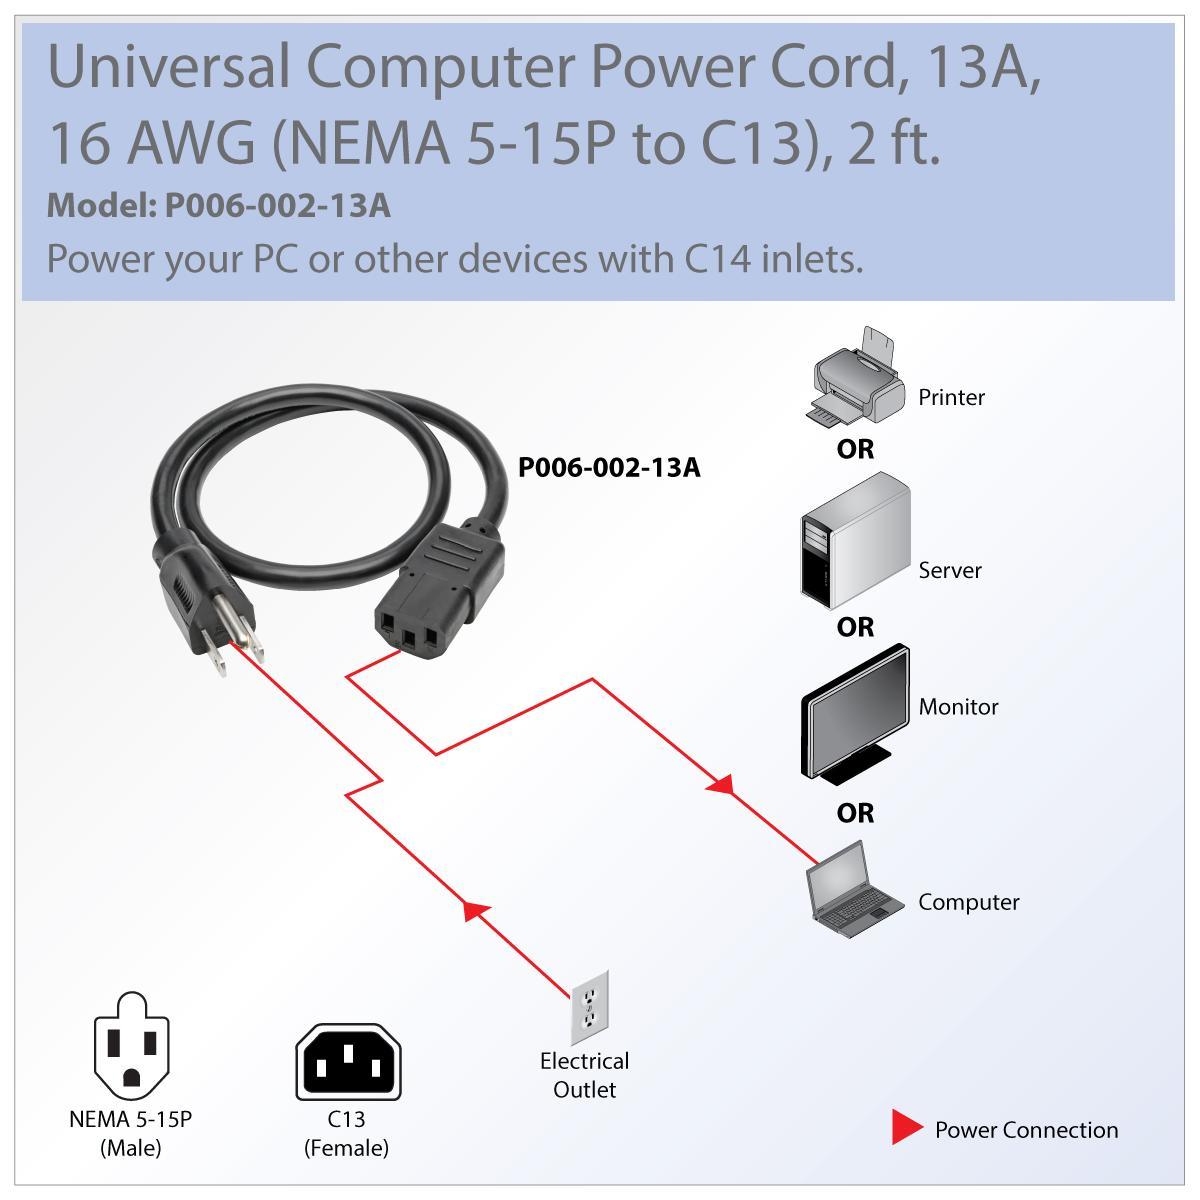 Computer Power Cord  13a  16awg  Nema 5